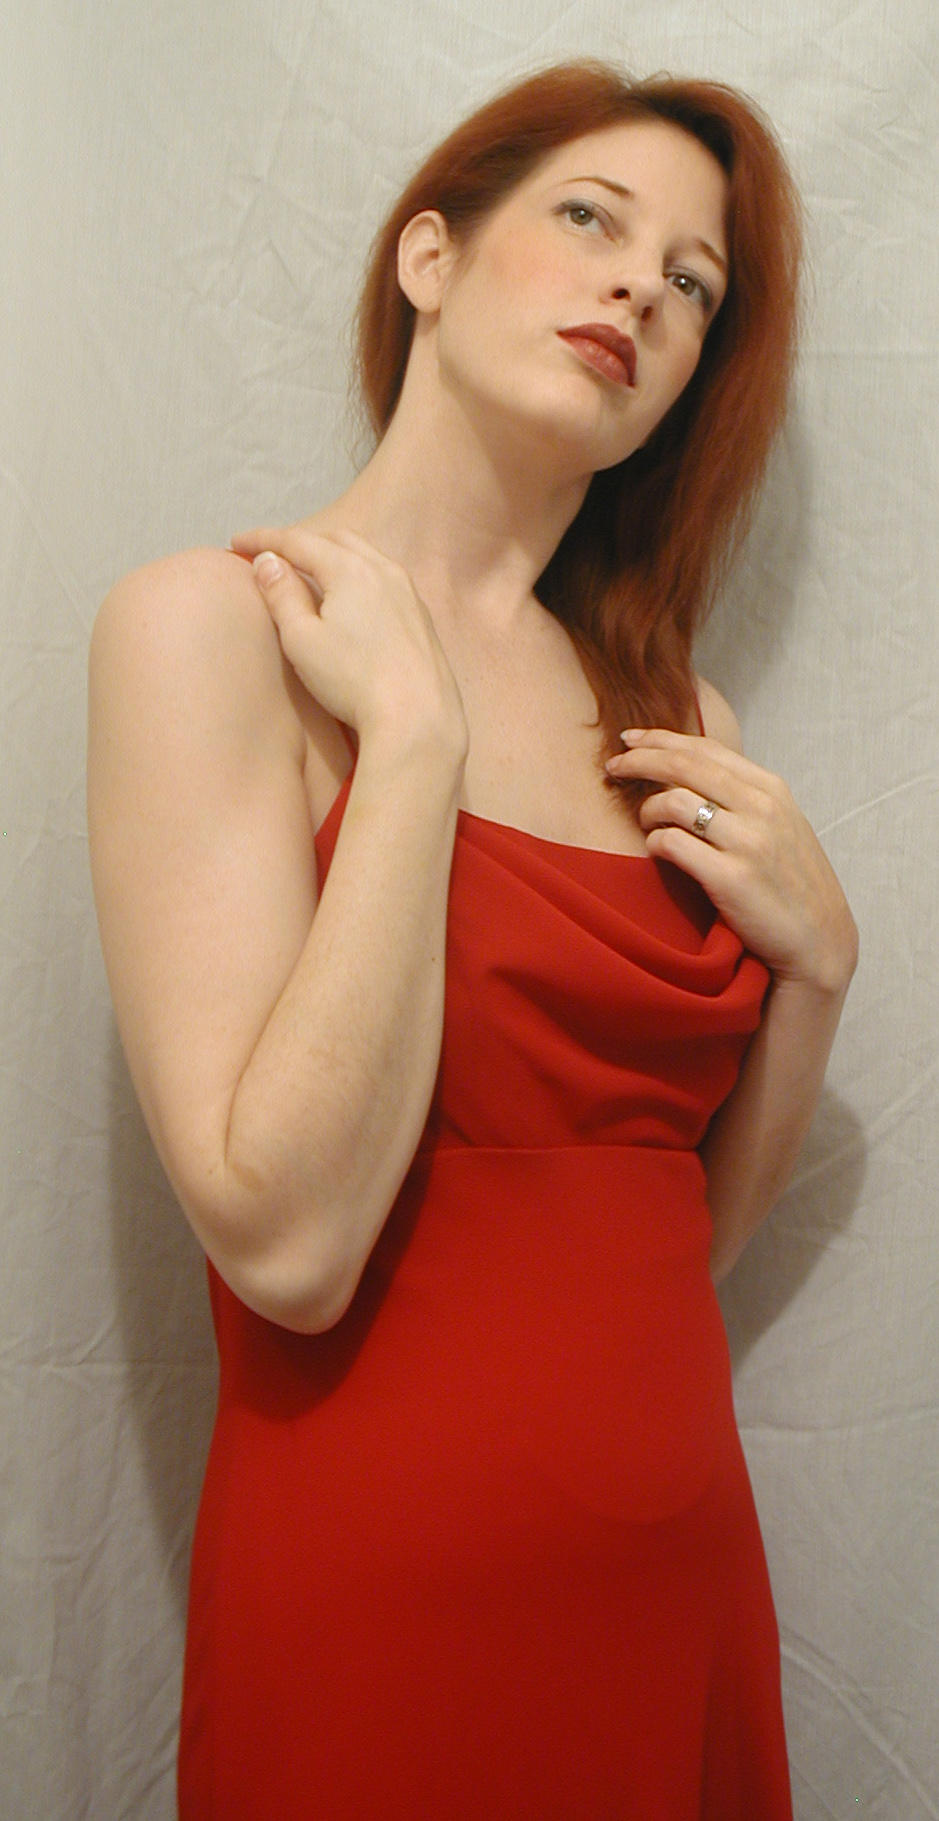 Red Dress 12 by lockstock